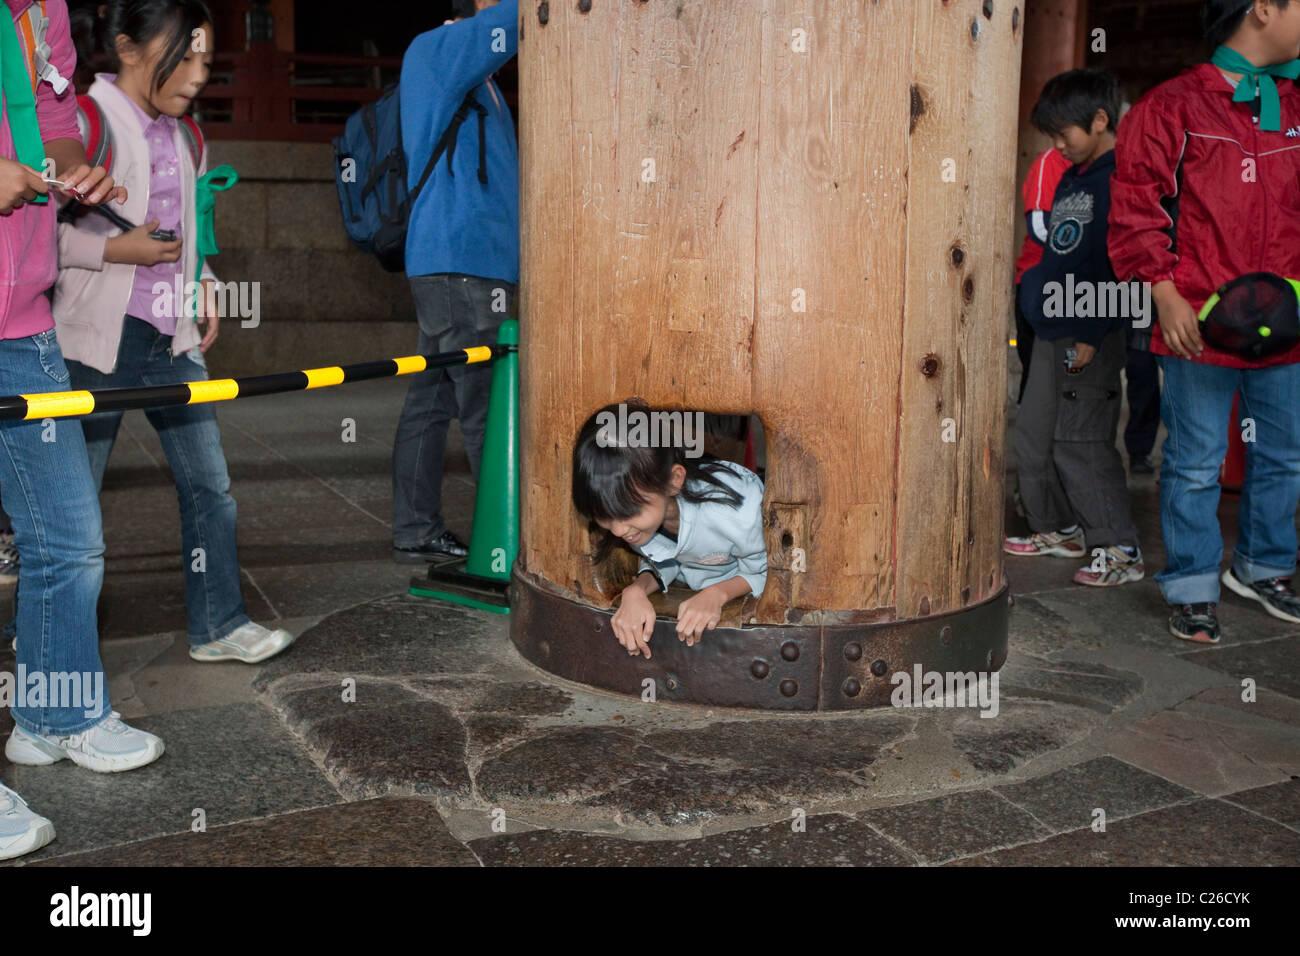 Schoolgirl squeezing through hole in wooden column in Daibutsu-den Hall at Todai-ji Temple, Nara, Japan. - Stock Image